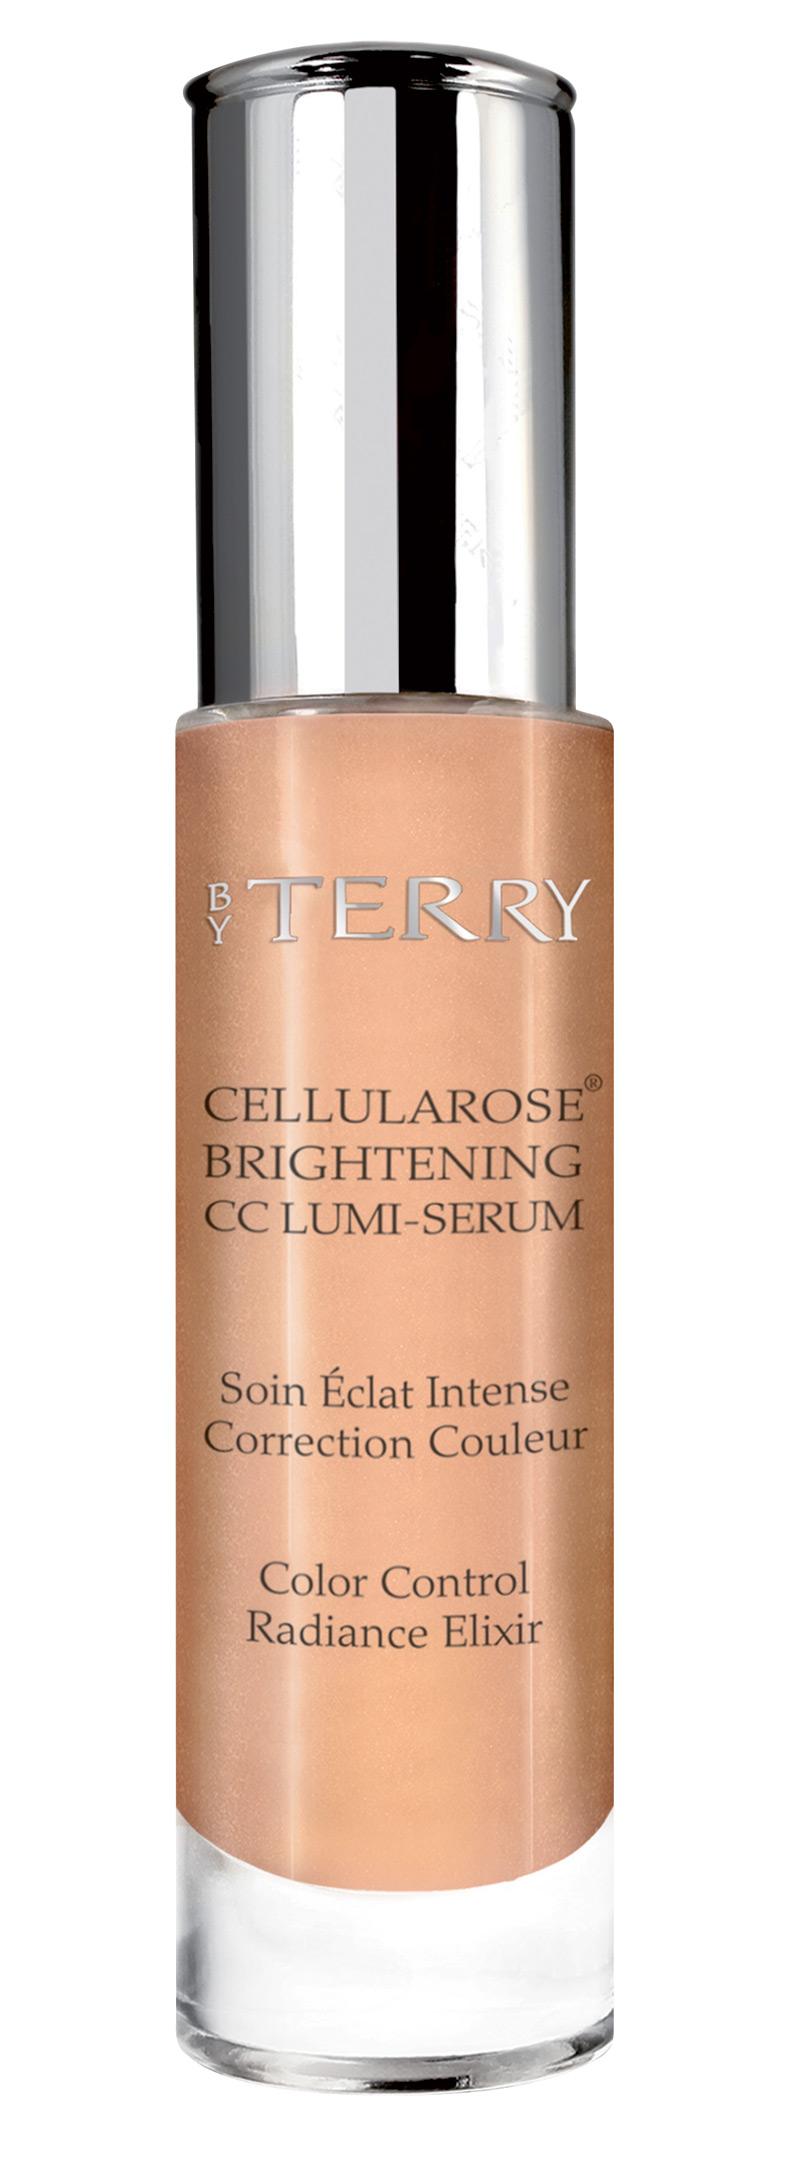 Cellularose-Brightening-CC-Lumi-Serum,-By-Terry